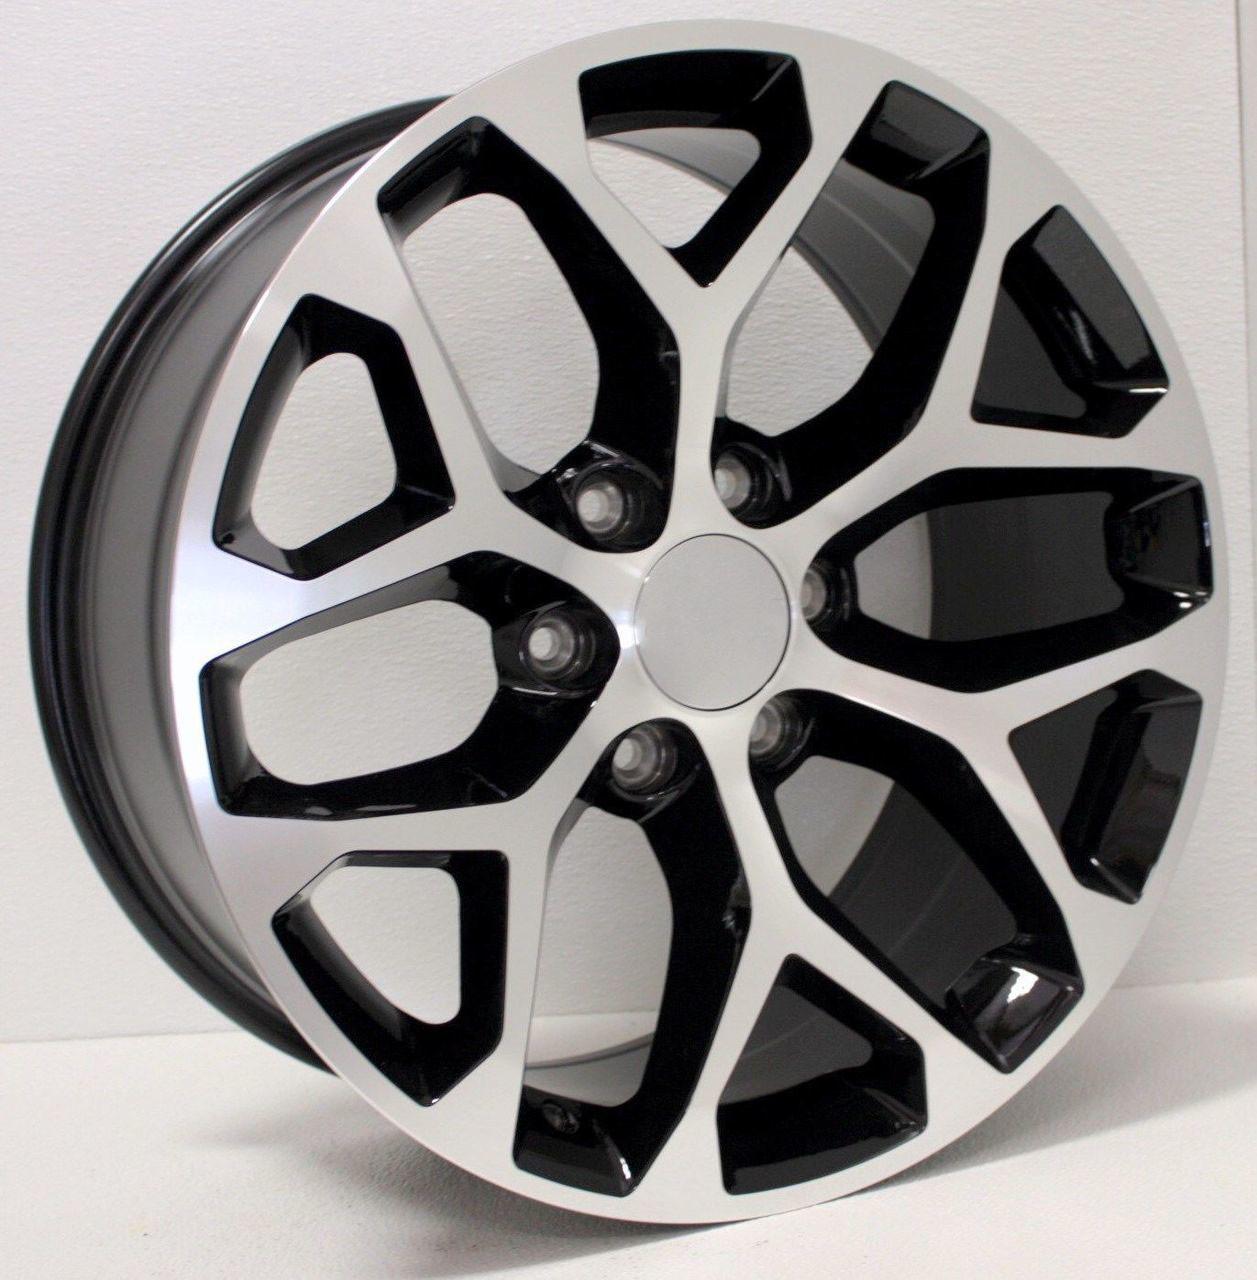 Gmc 22 Inch Black And Machine Snowflake Rims For Sierra Z71 Yukon